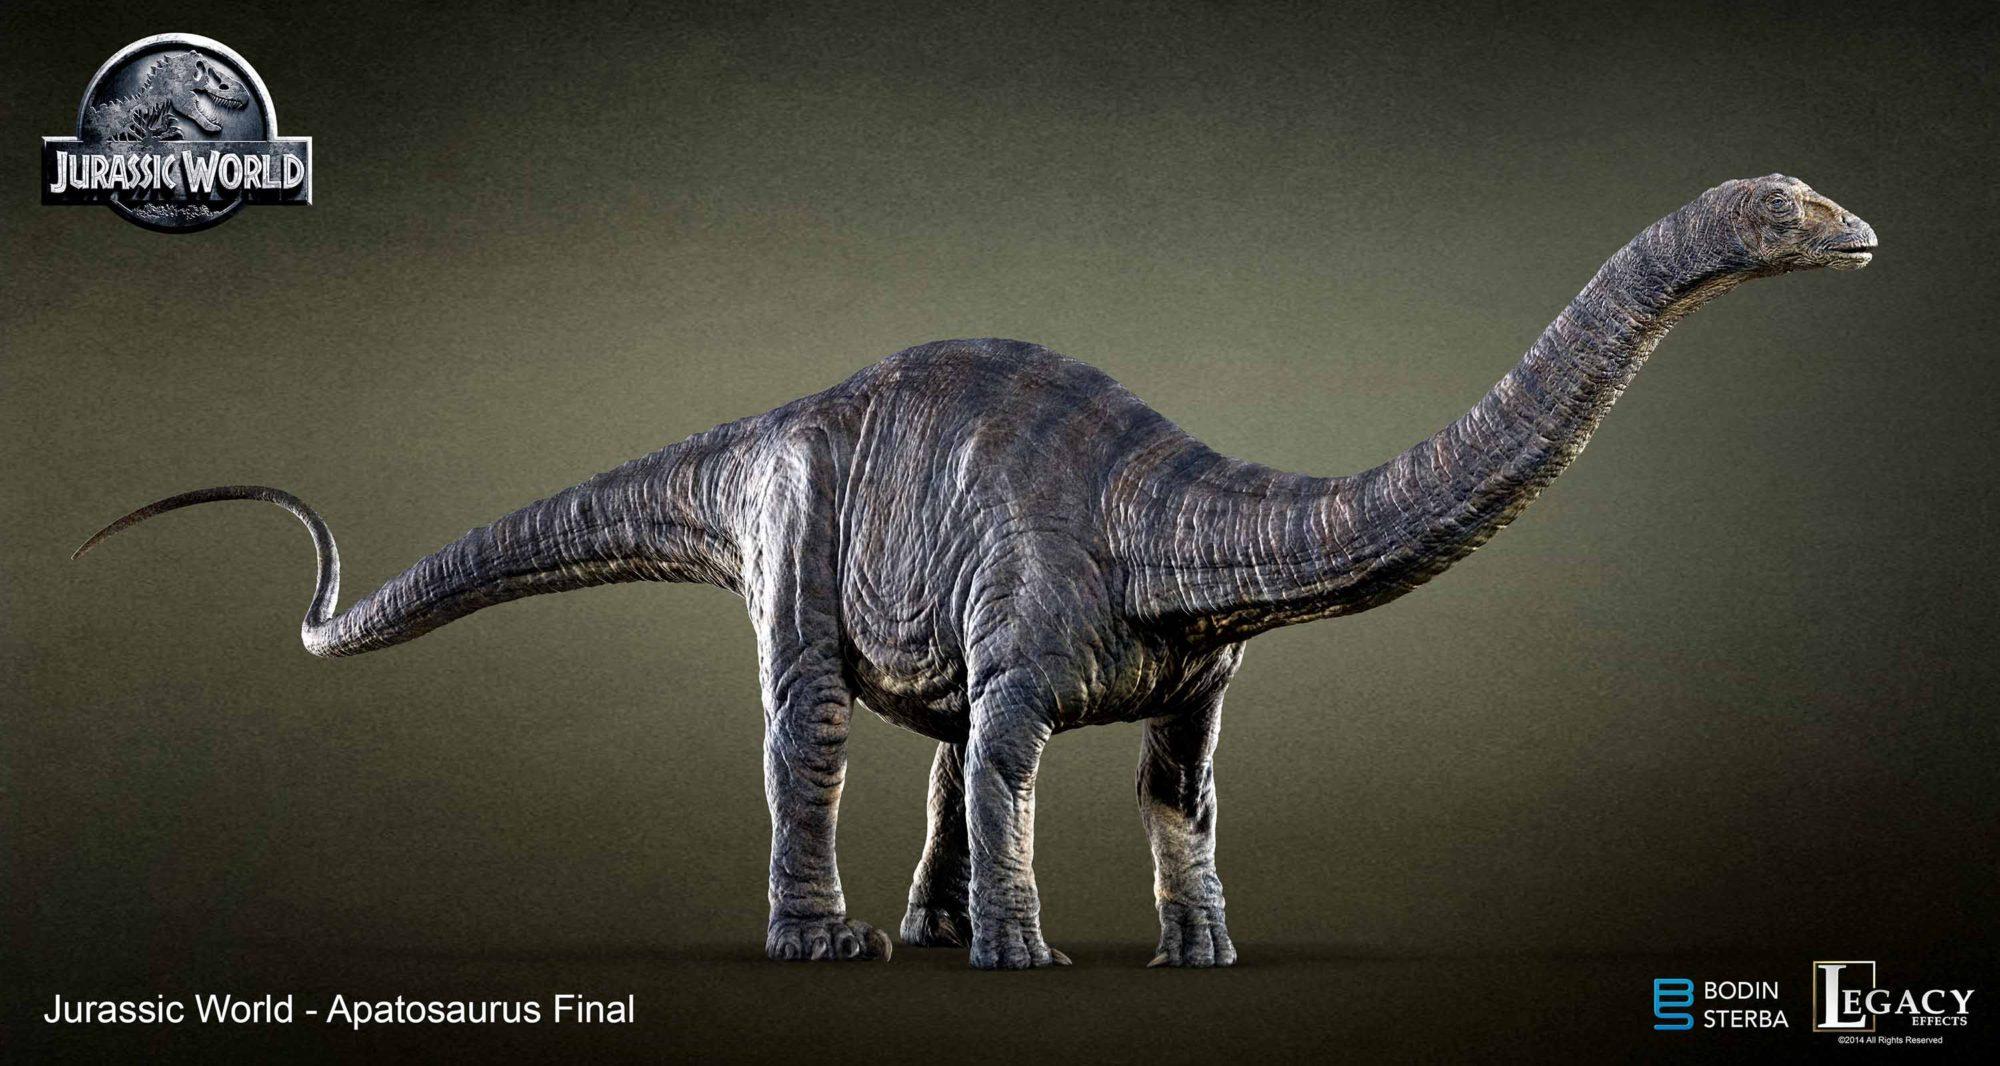 My Jurassic World Apatosaurus final design.